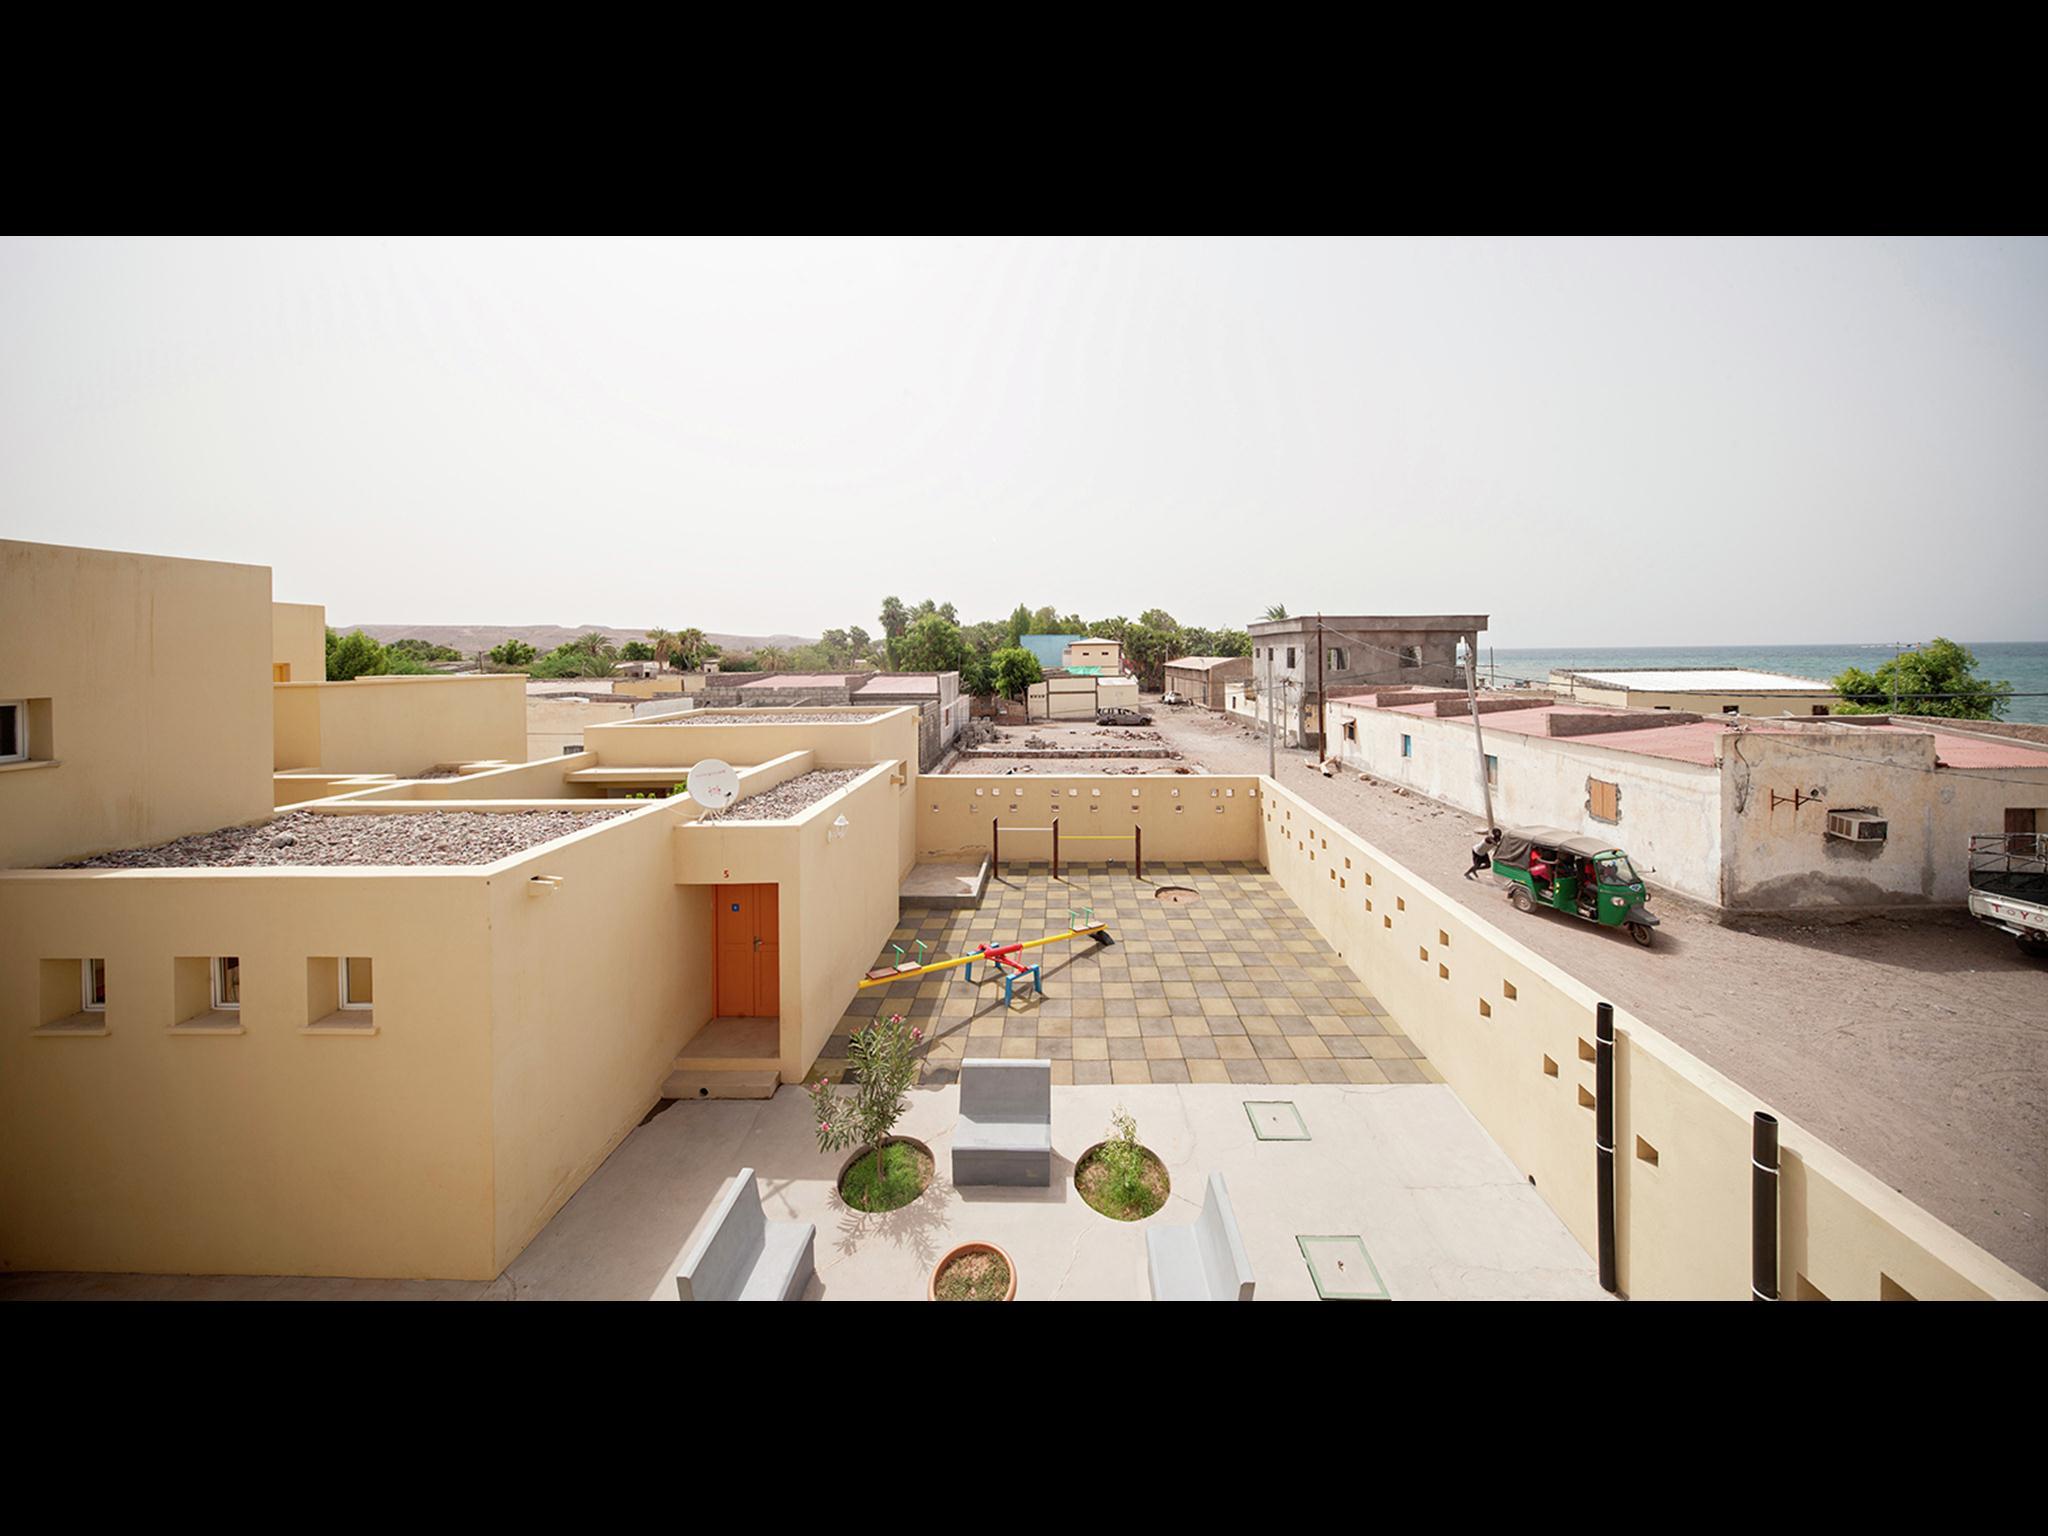 SOS_Village_Djibouti_-_Squares_(11)